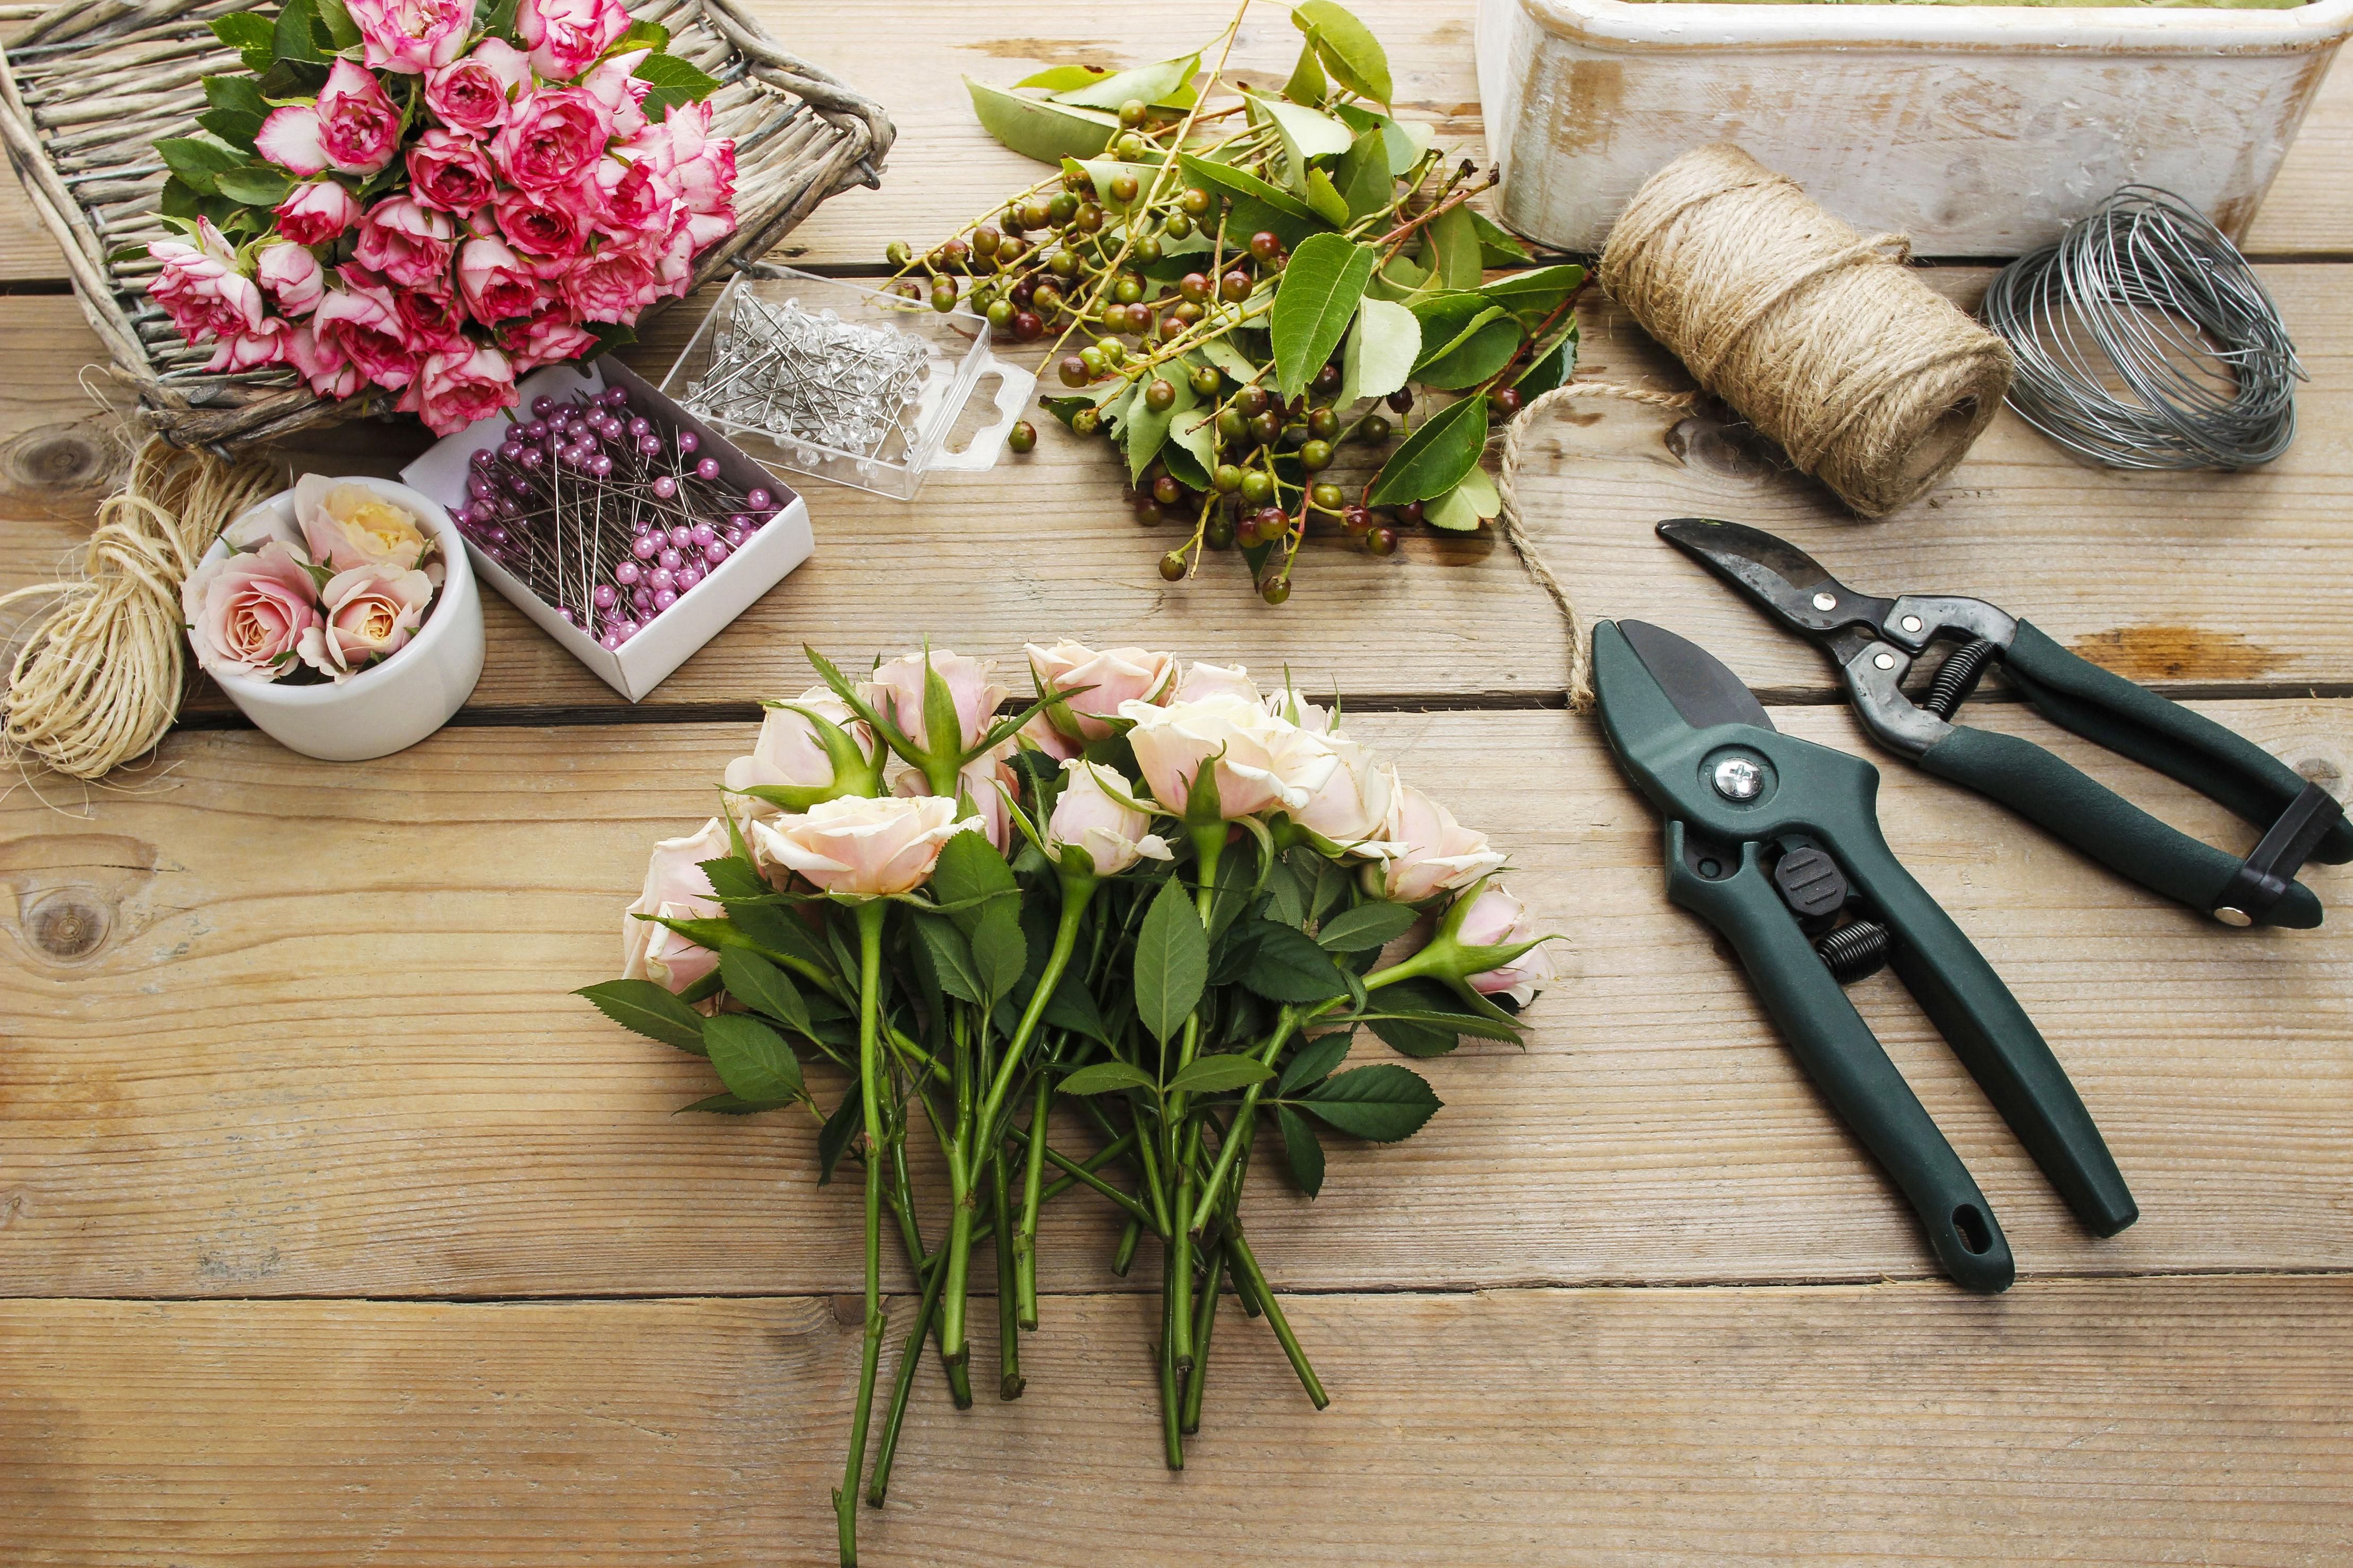 ht florist deko 10